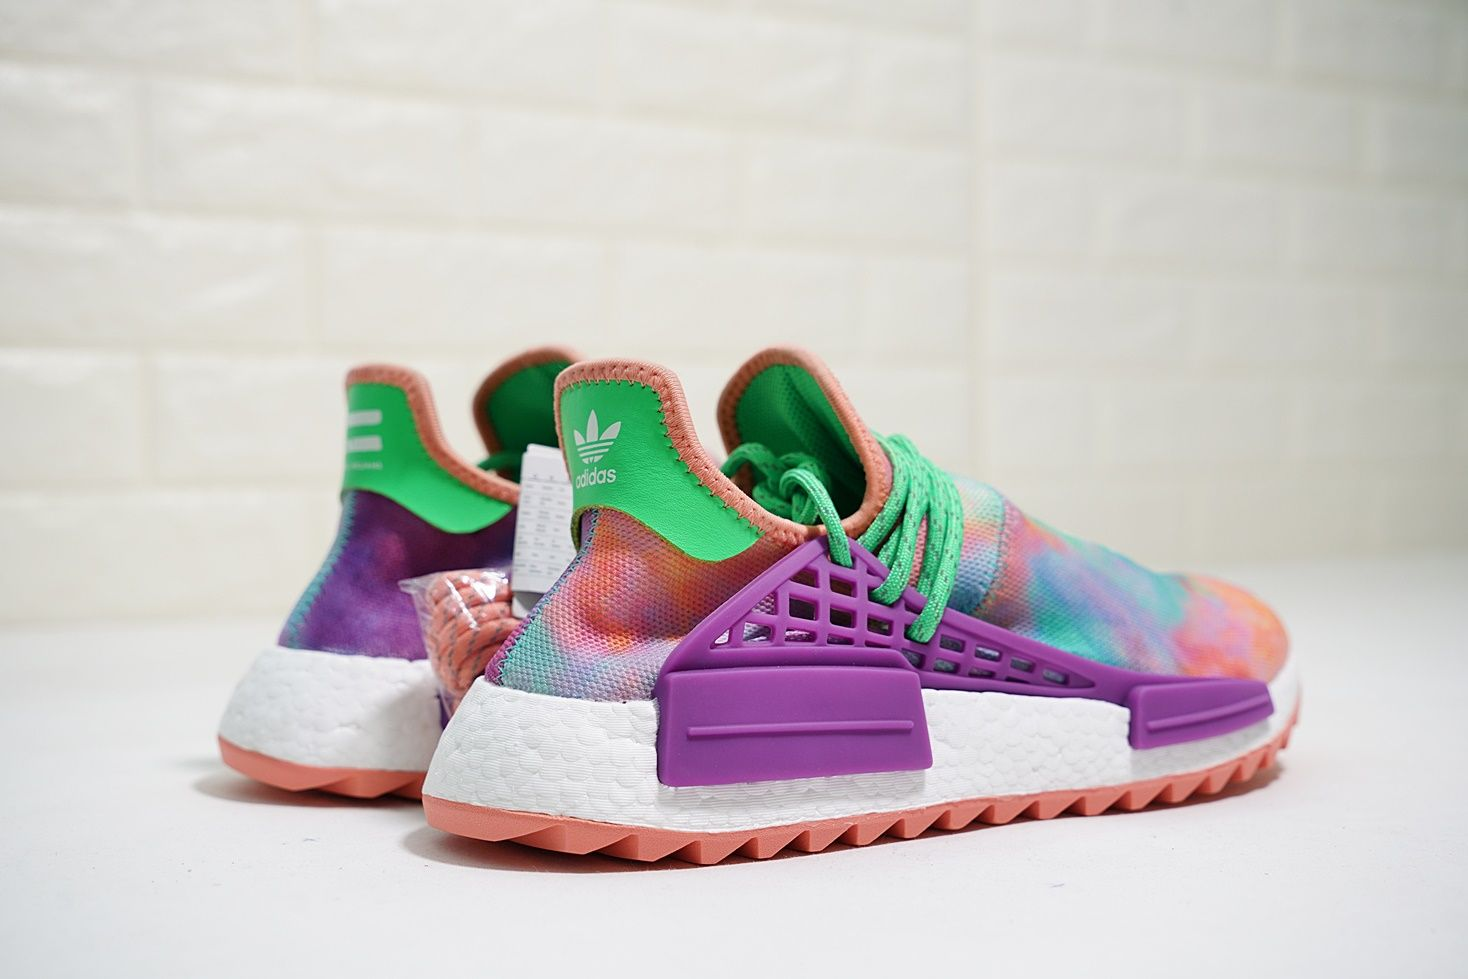 Adidas Pharrell Williams Human Race Holi Nmd Chalk Coral Green